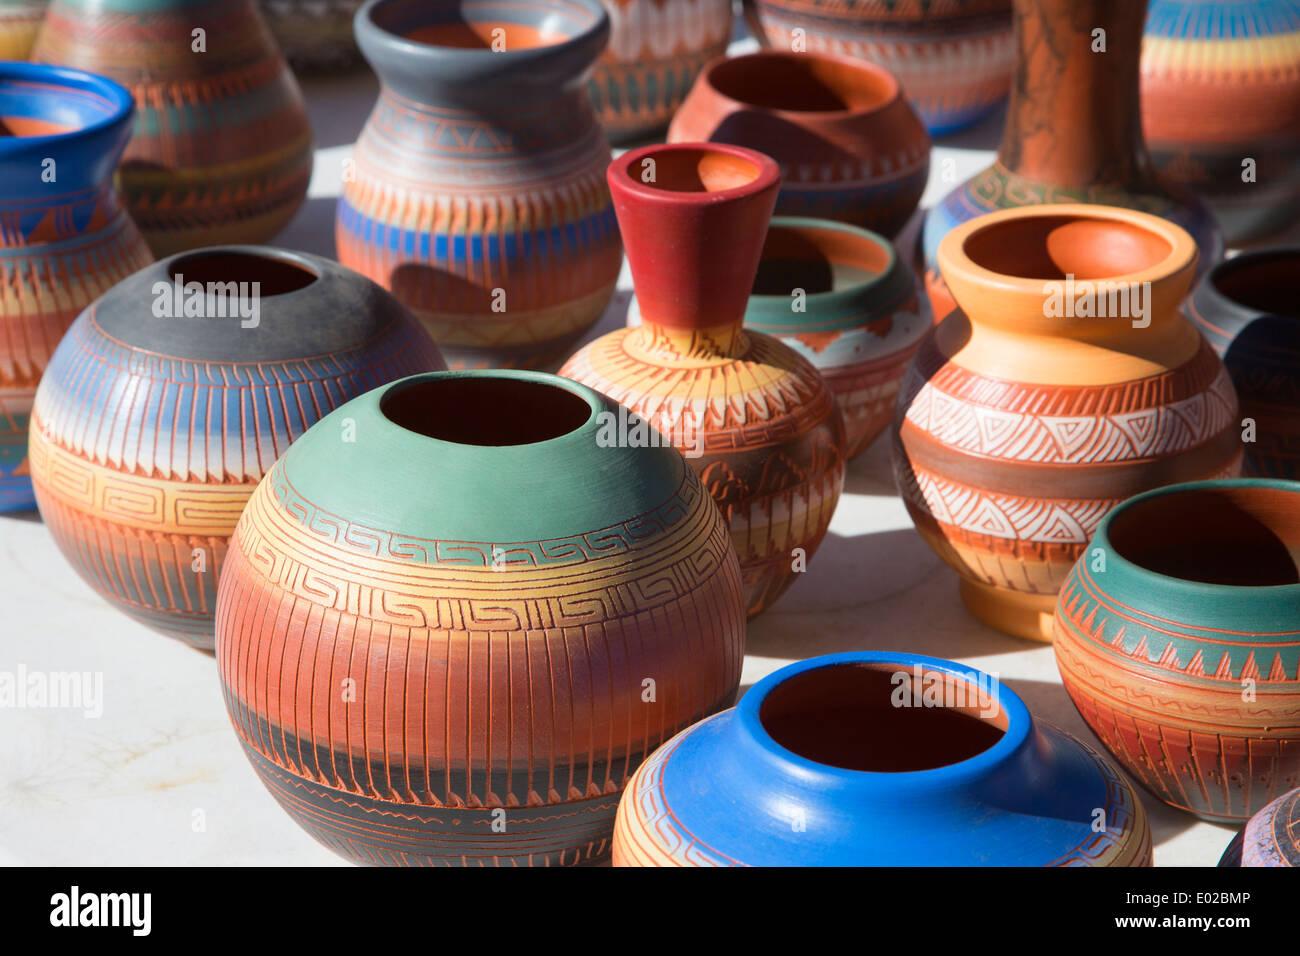 Navajo pottery for sale at outdoor street market in Santa Fe - Stock Image